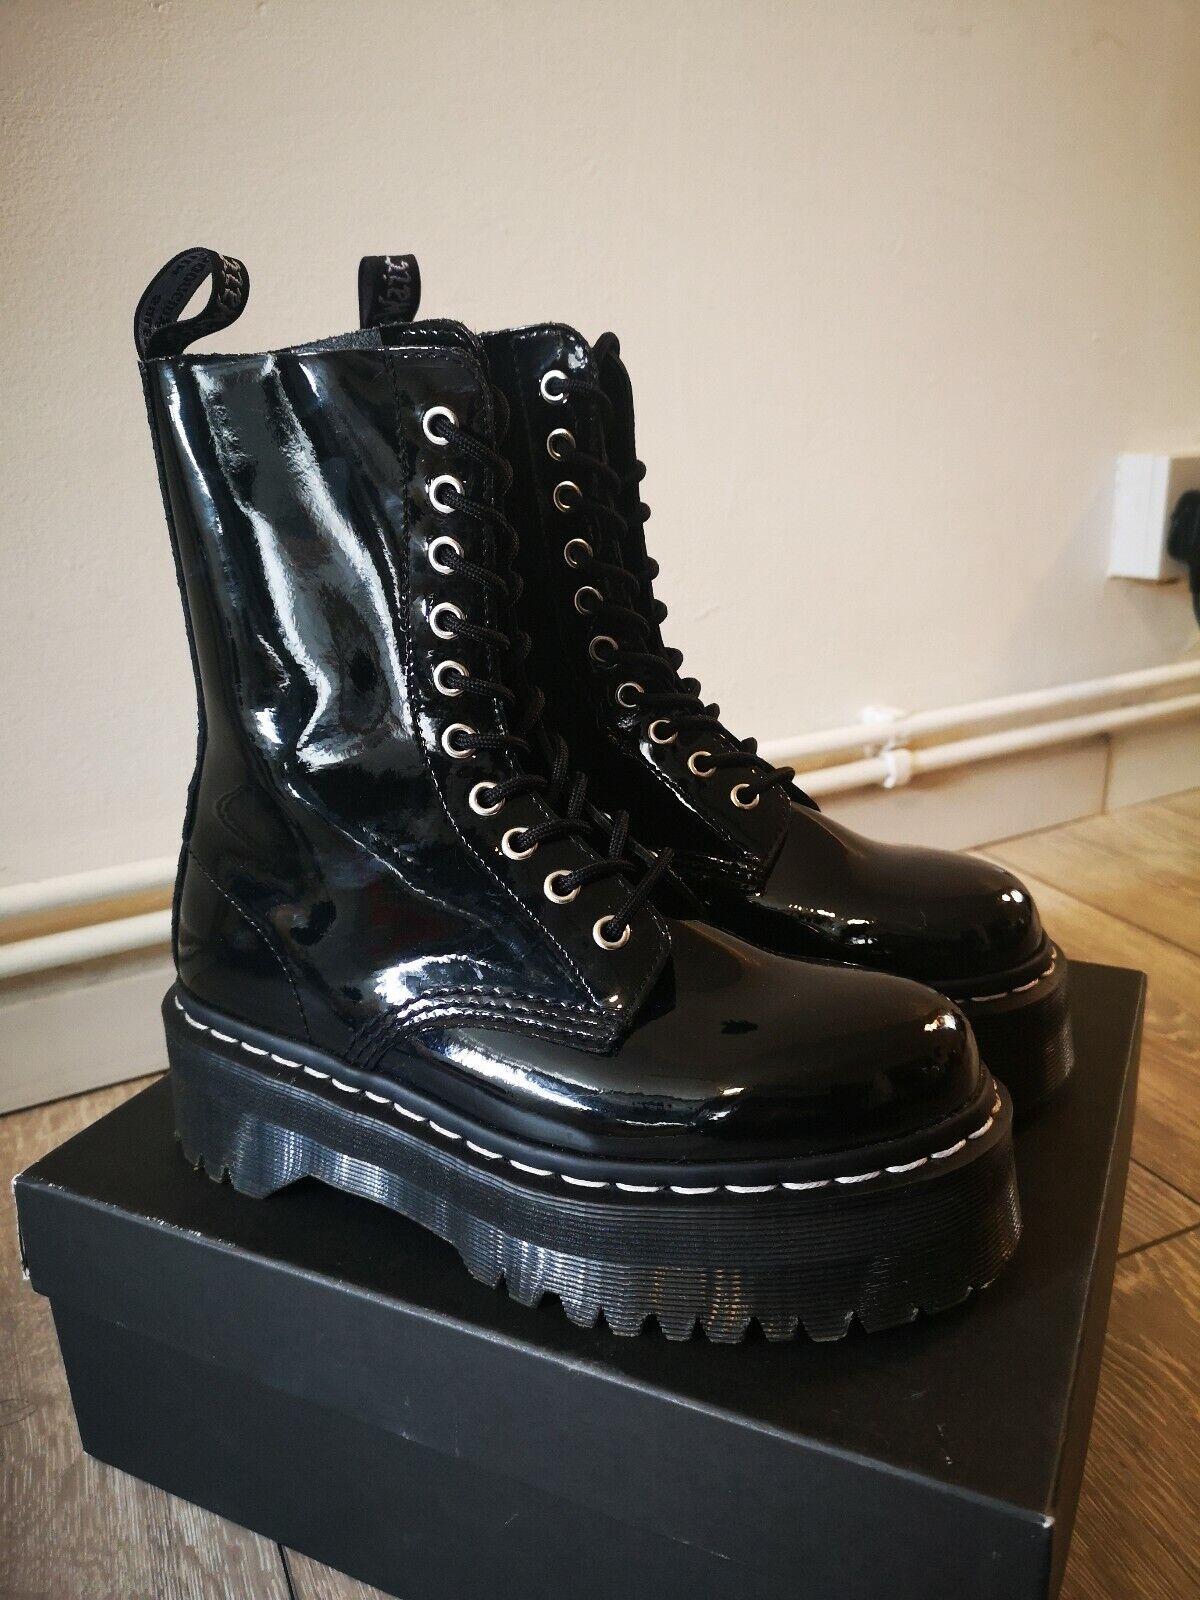 Agyness Deyn Dr Martens 10 eyelet Black Black Black Patent Pnatform Jadon Boot Rare Size 4 2728d1